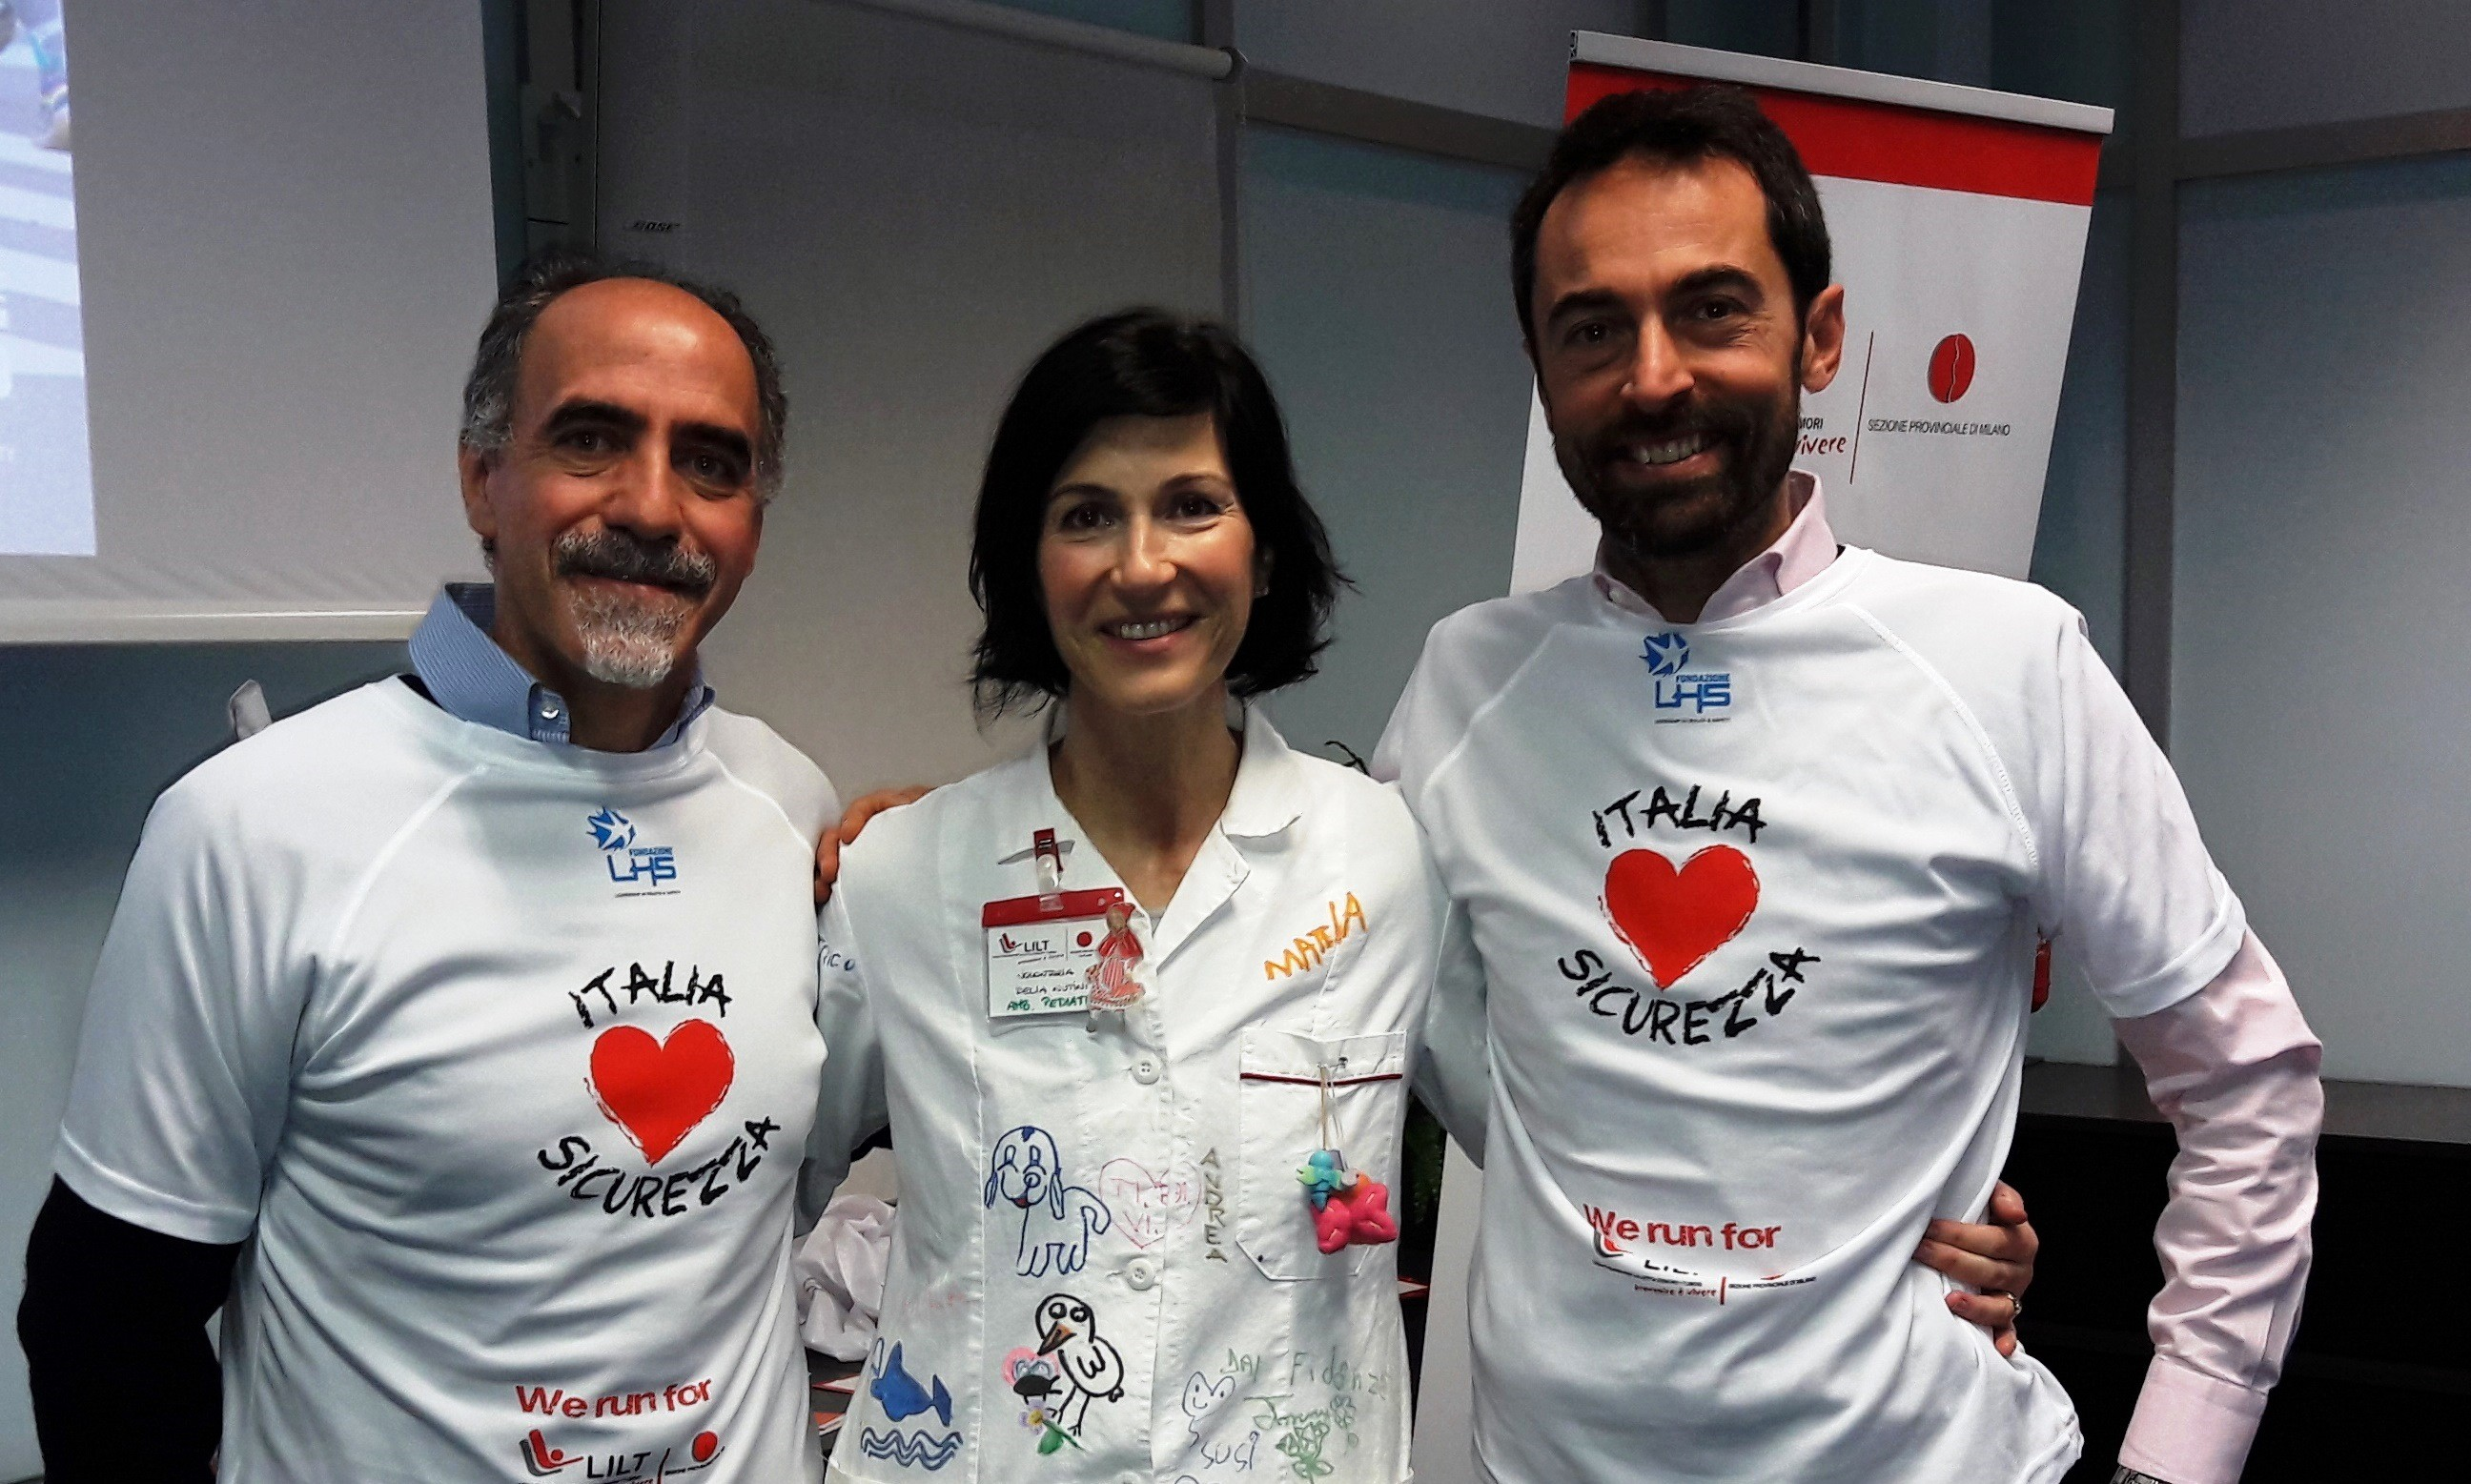 Fondazione LHS 54-Elia Carrara